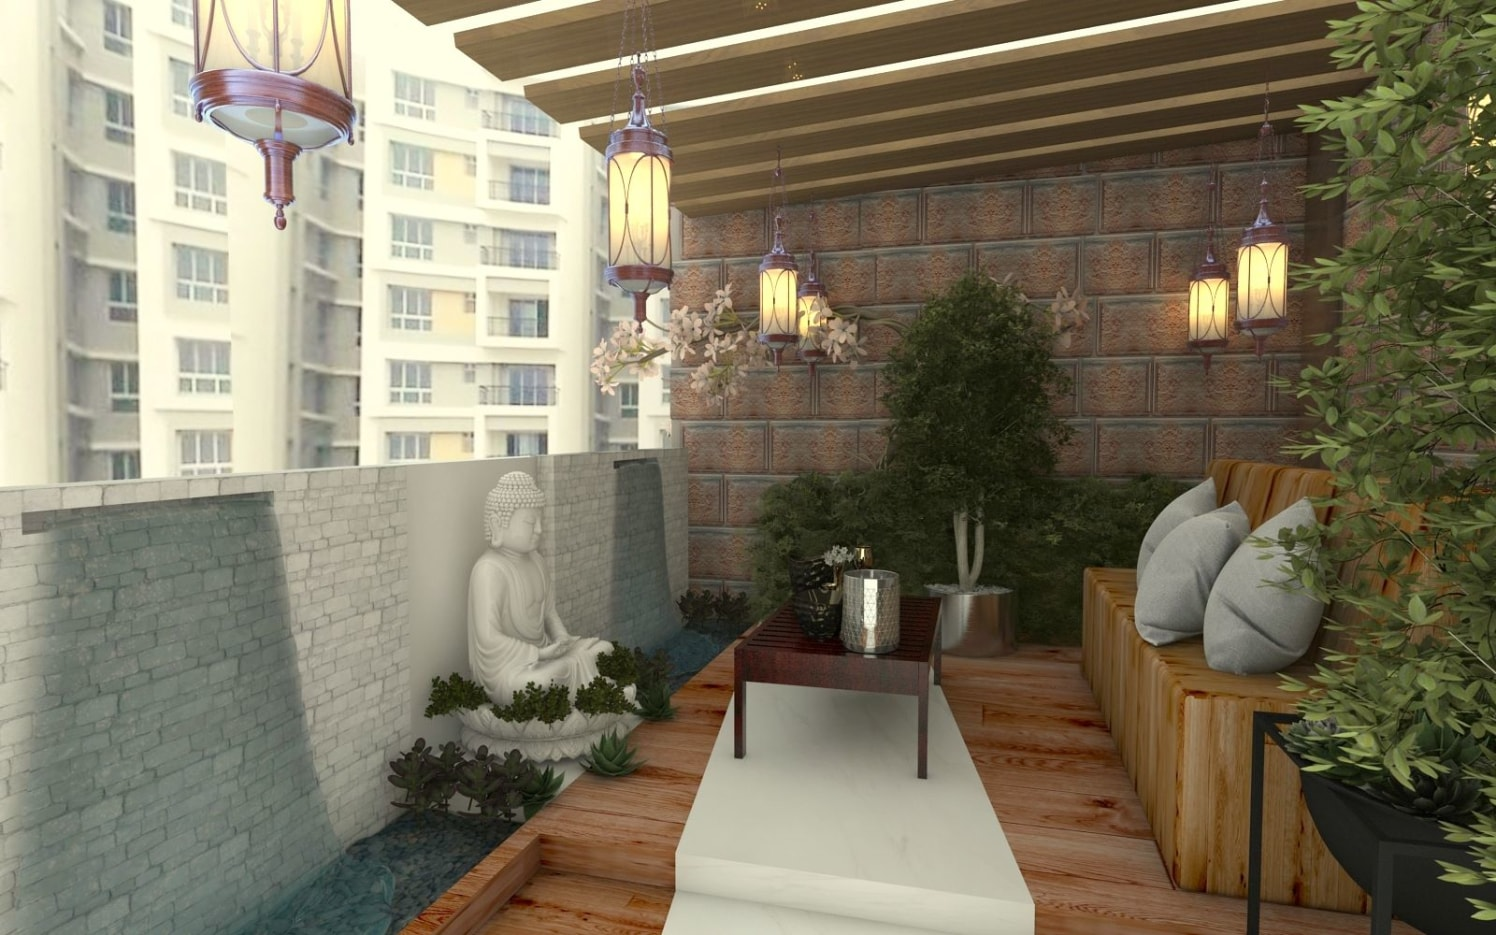 Artistic Balcony With Wooden Seating by Regalias Interiors Open-spaces Contemporary | Interior Design Photos & Ideas